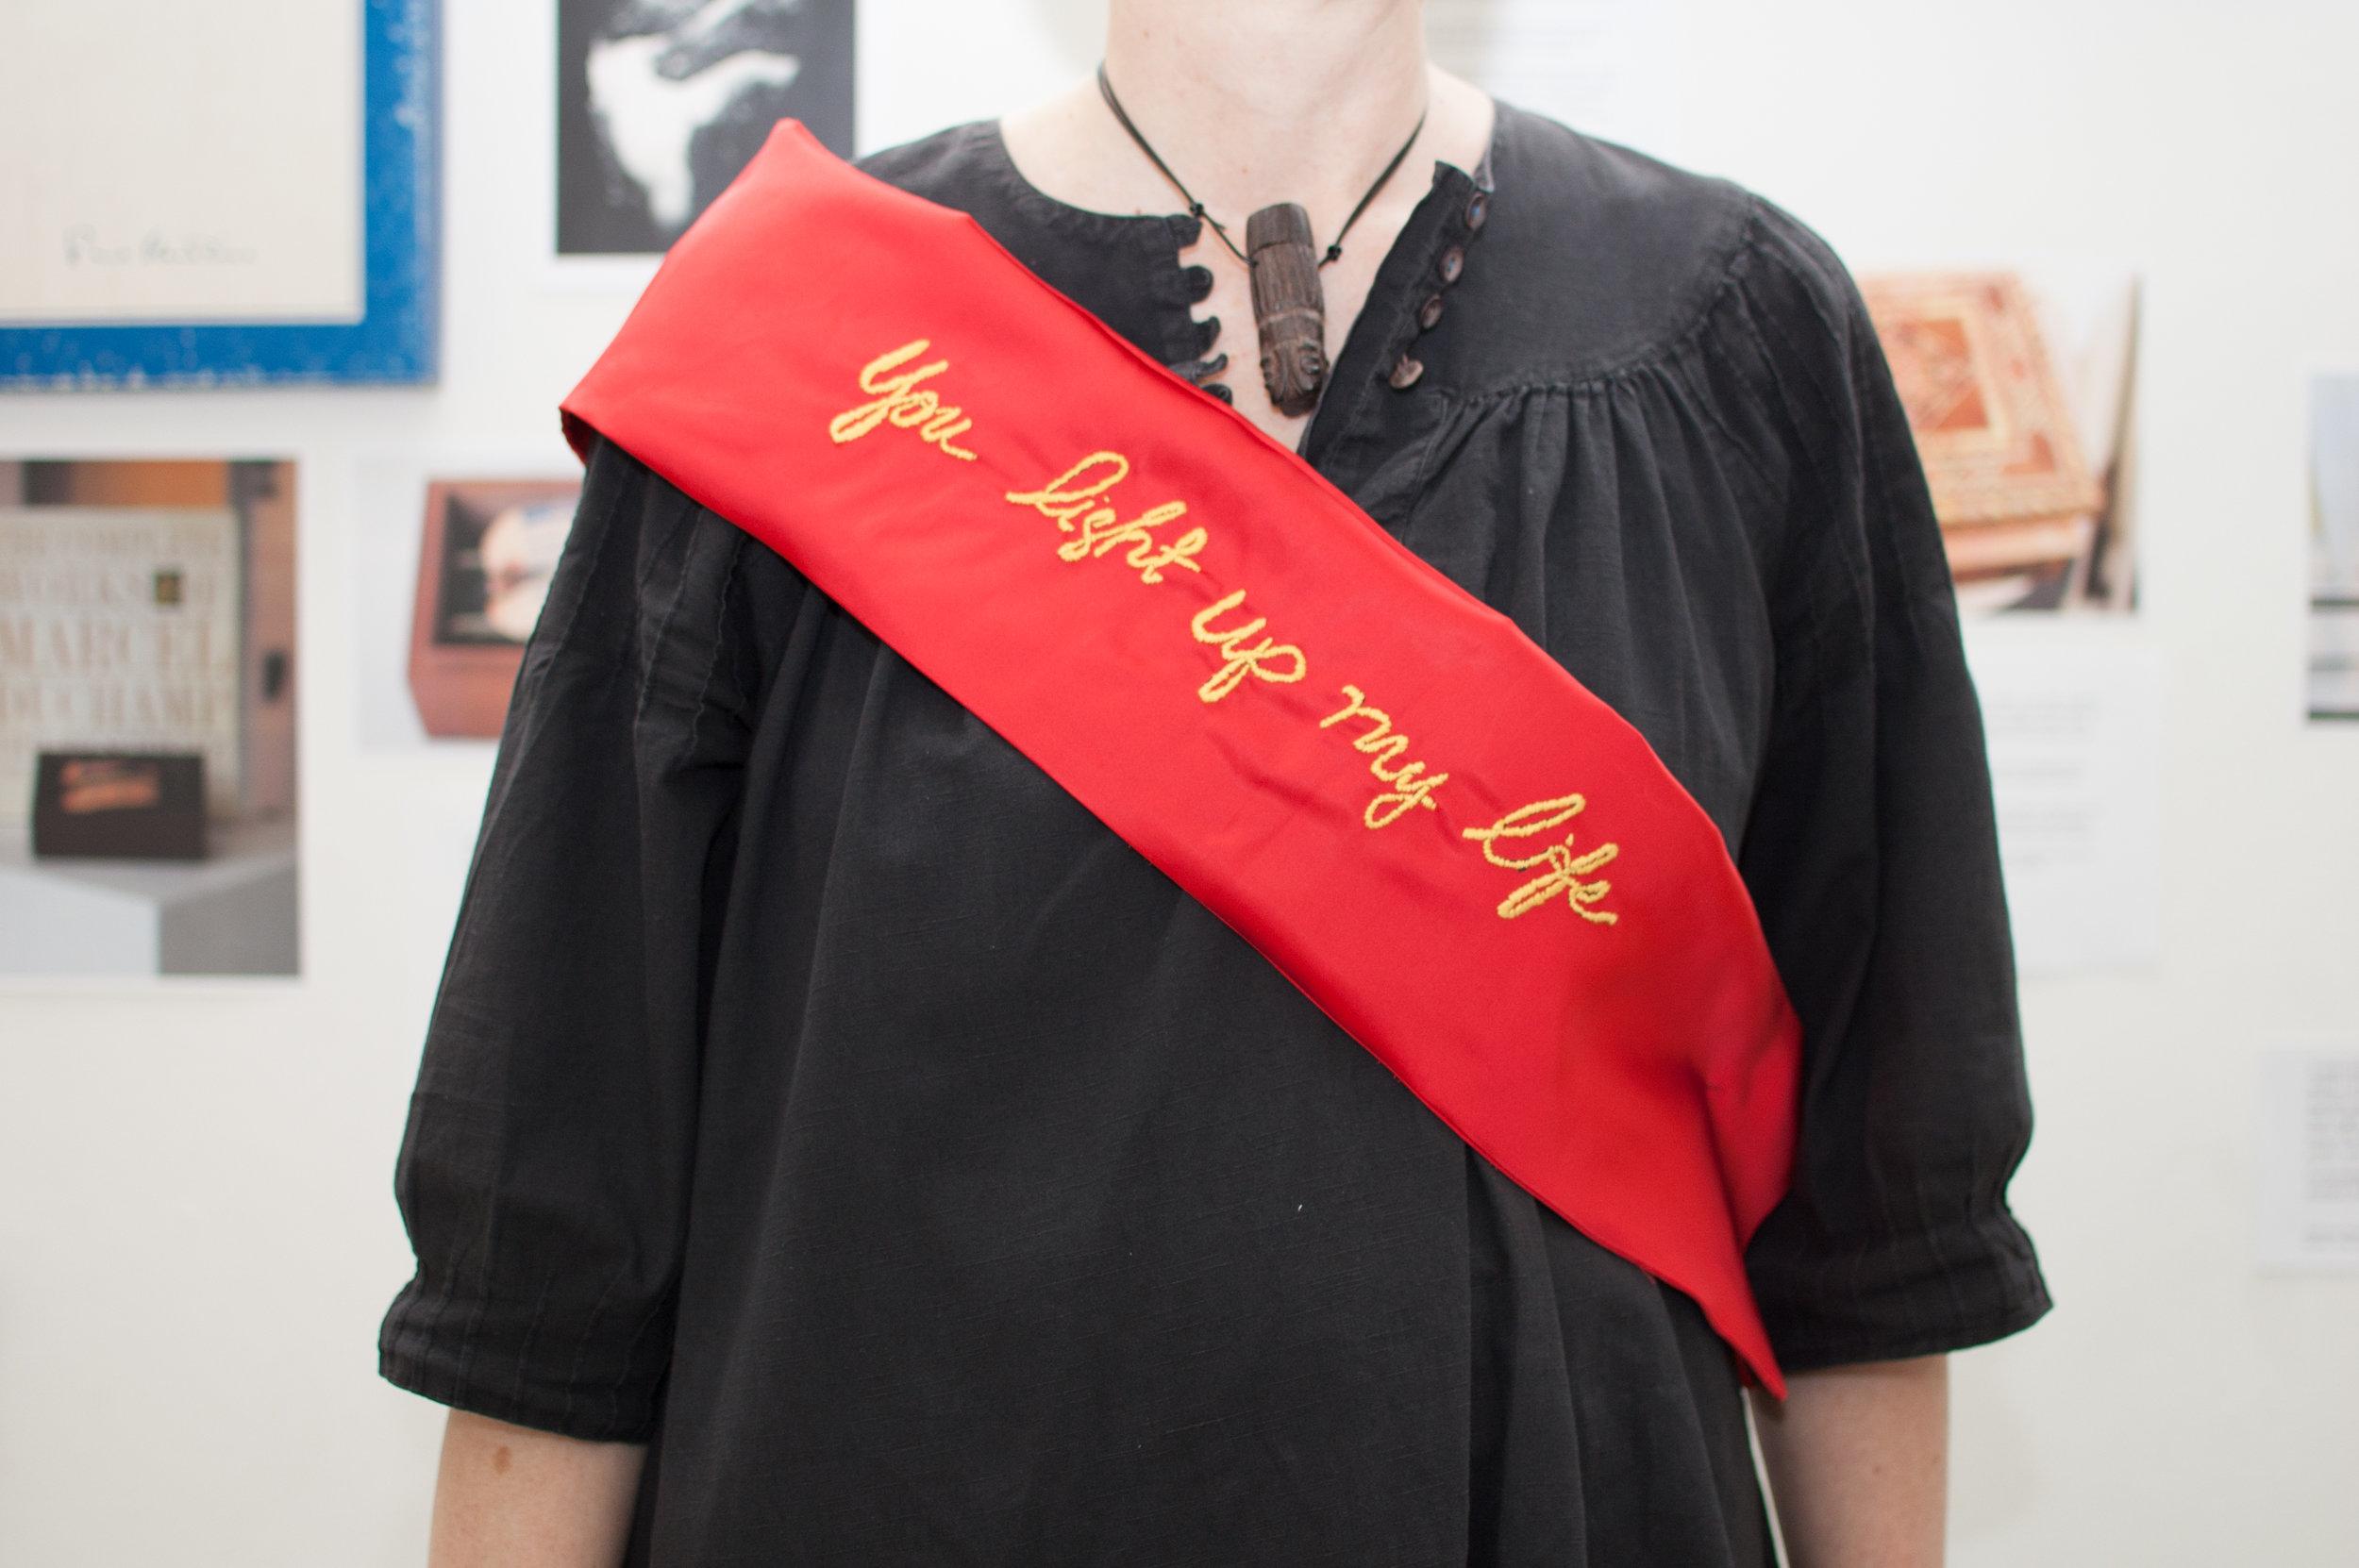 "You light up my life , Award Sash: vintage satin, embroidery thread, 8 x 48"", 2013 (Photograph: Ashley Wood)"